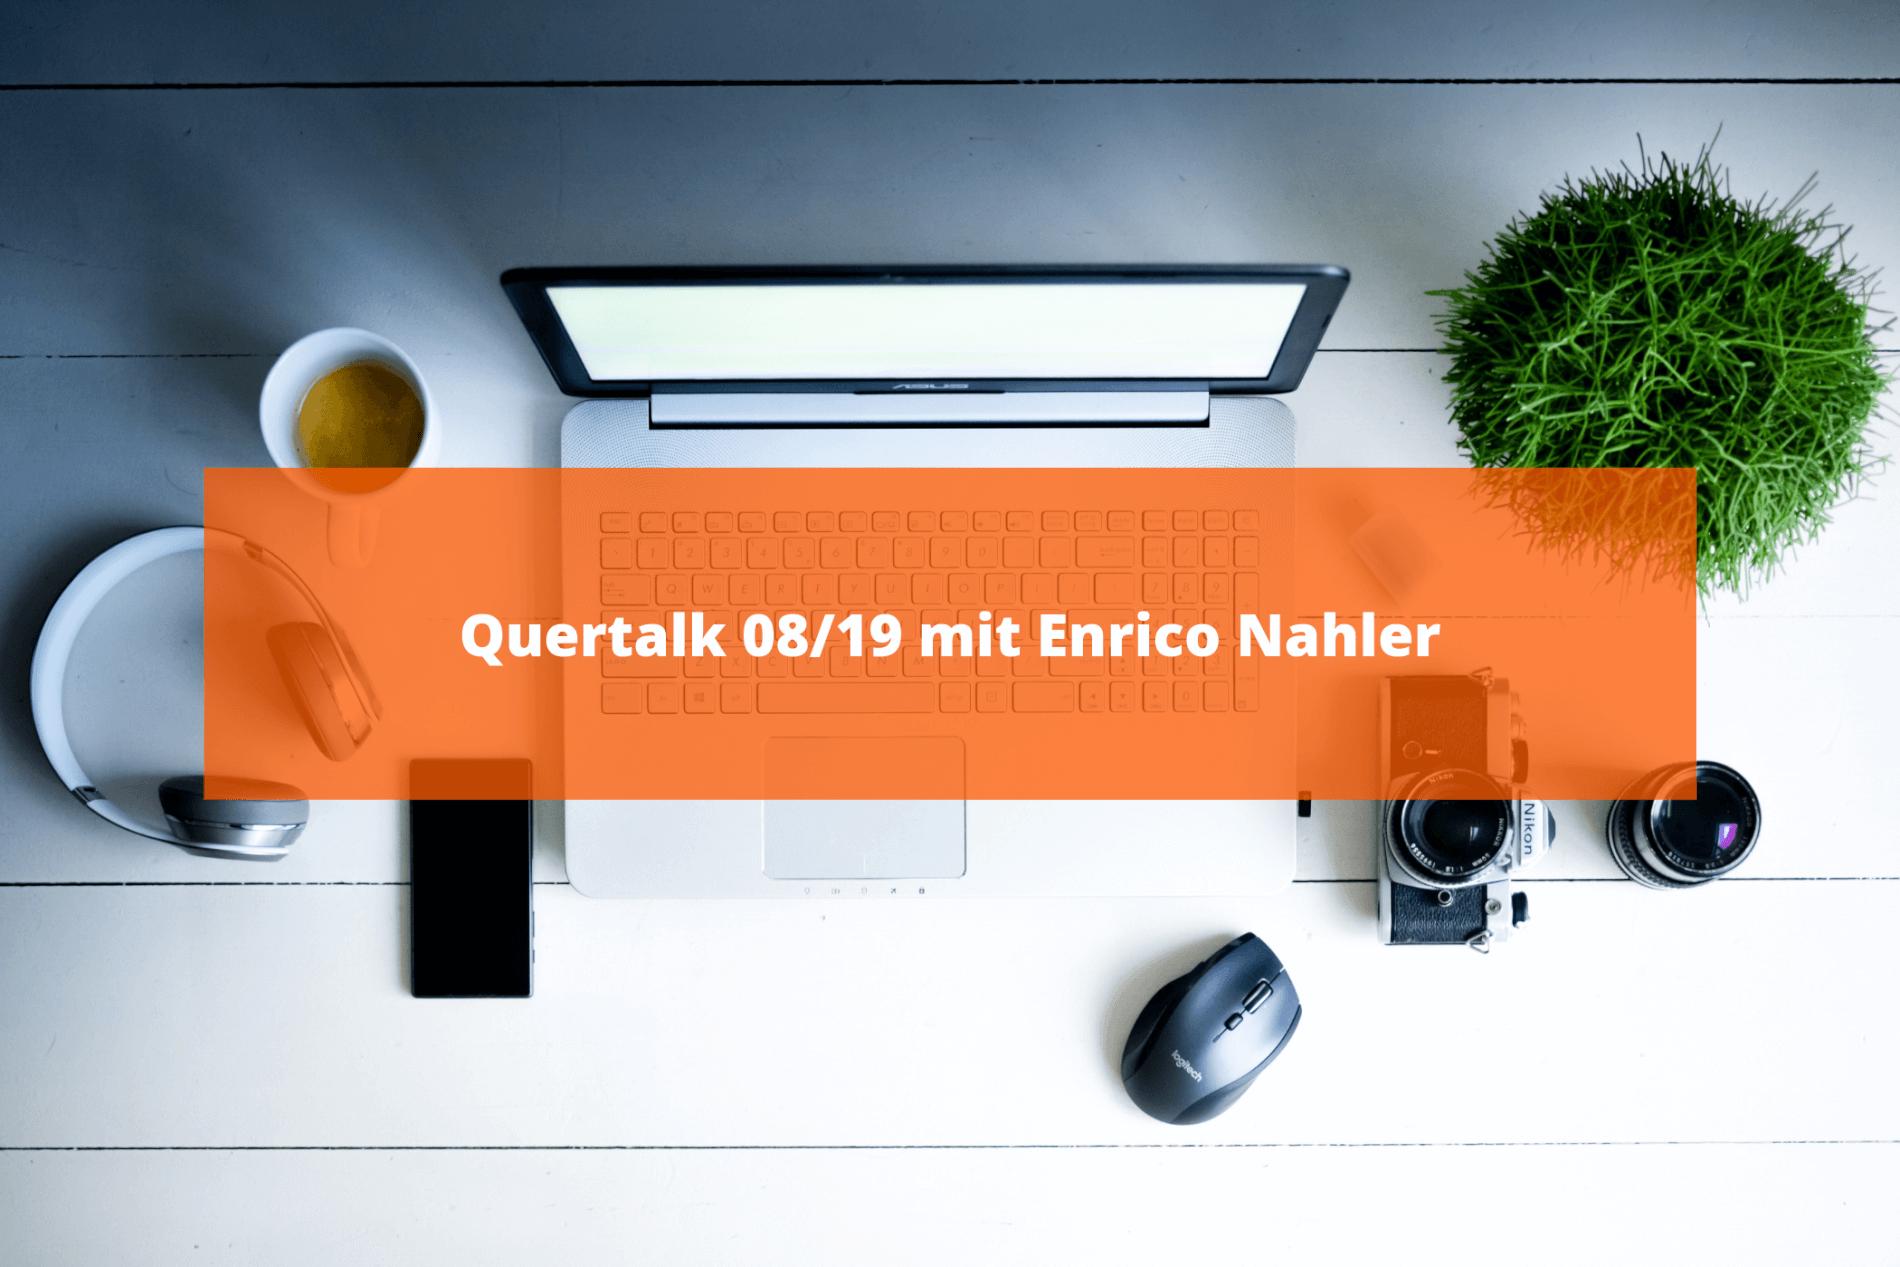 Quertalk 08/19 mit Enrico Nahler